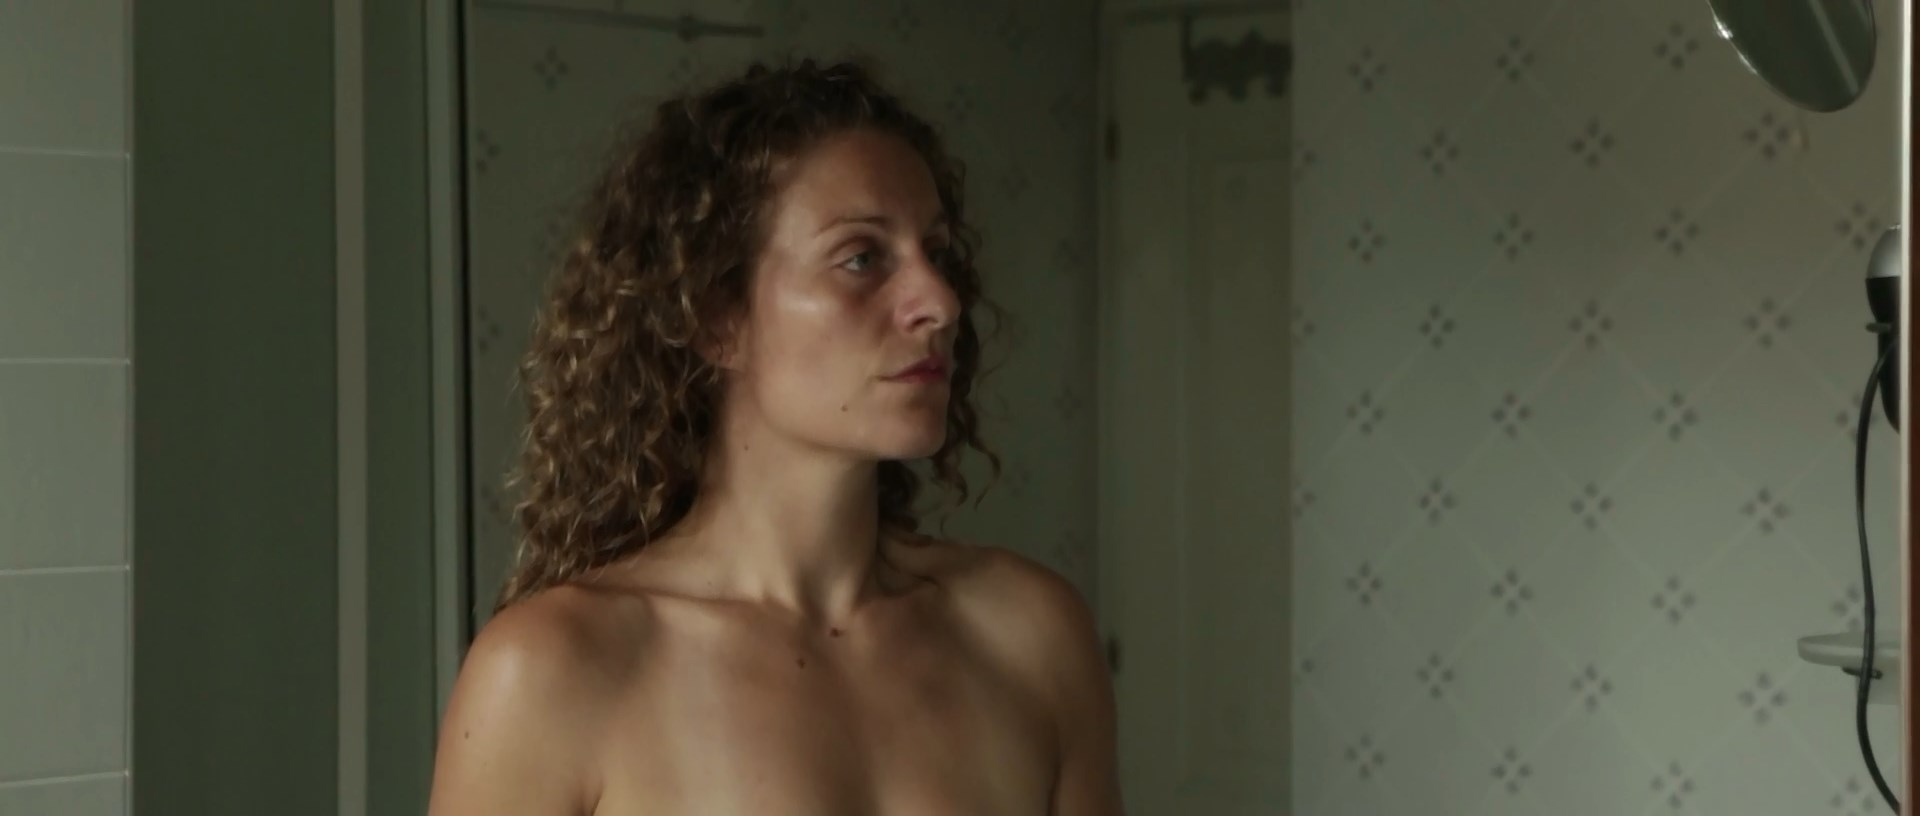 Nackt susanne hoss Schauspielerin Susanne